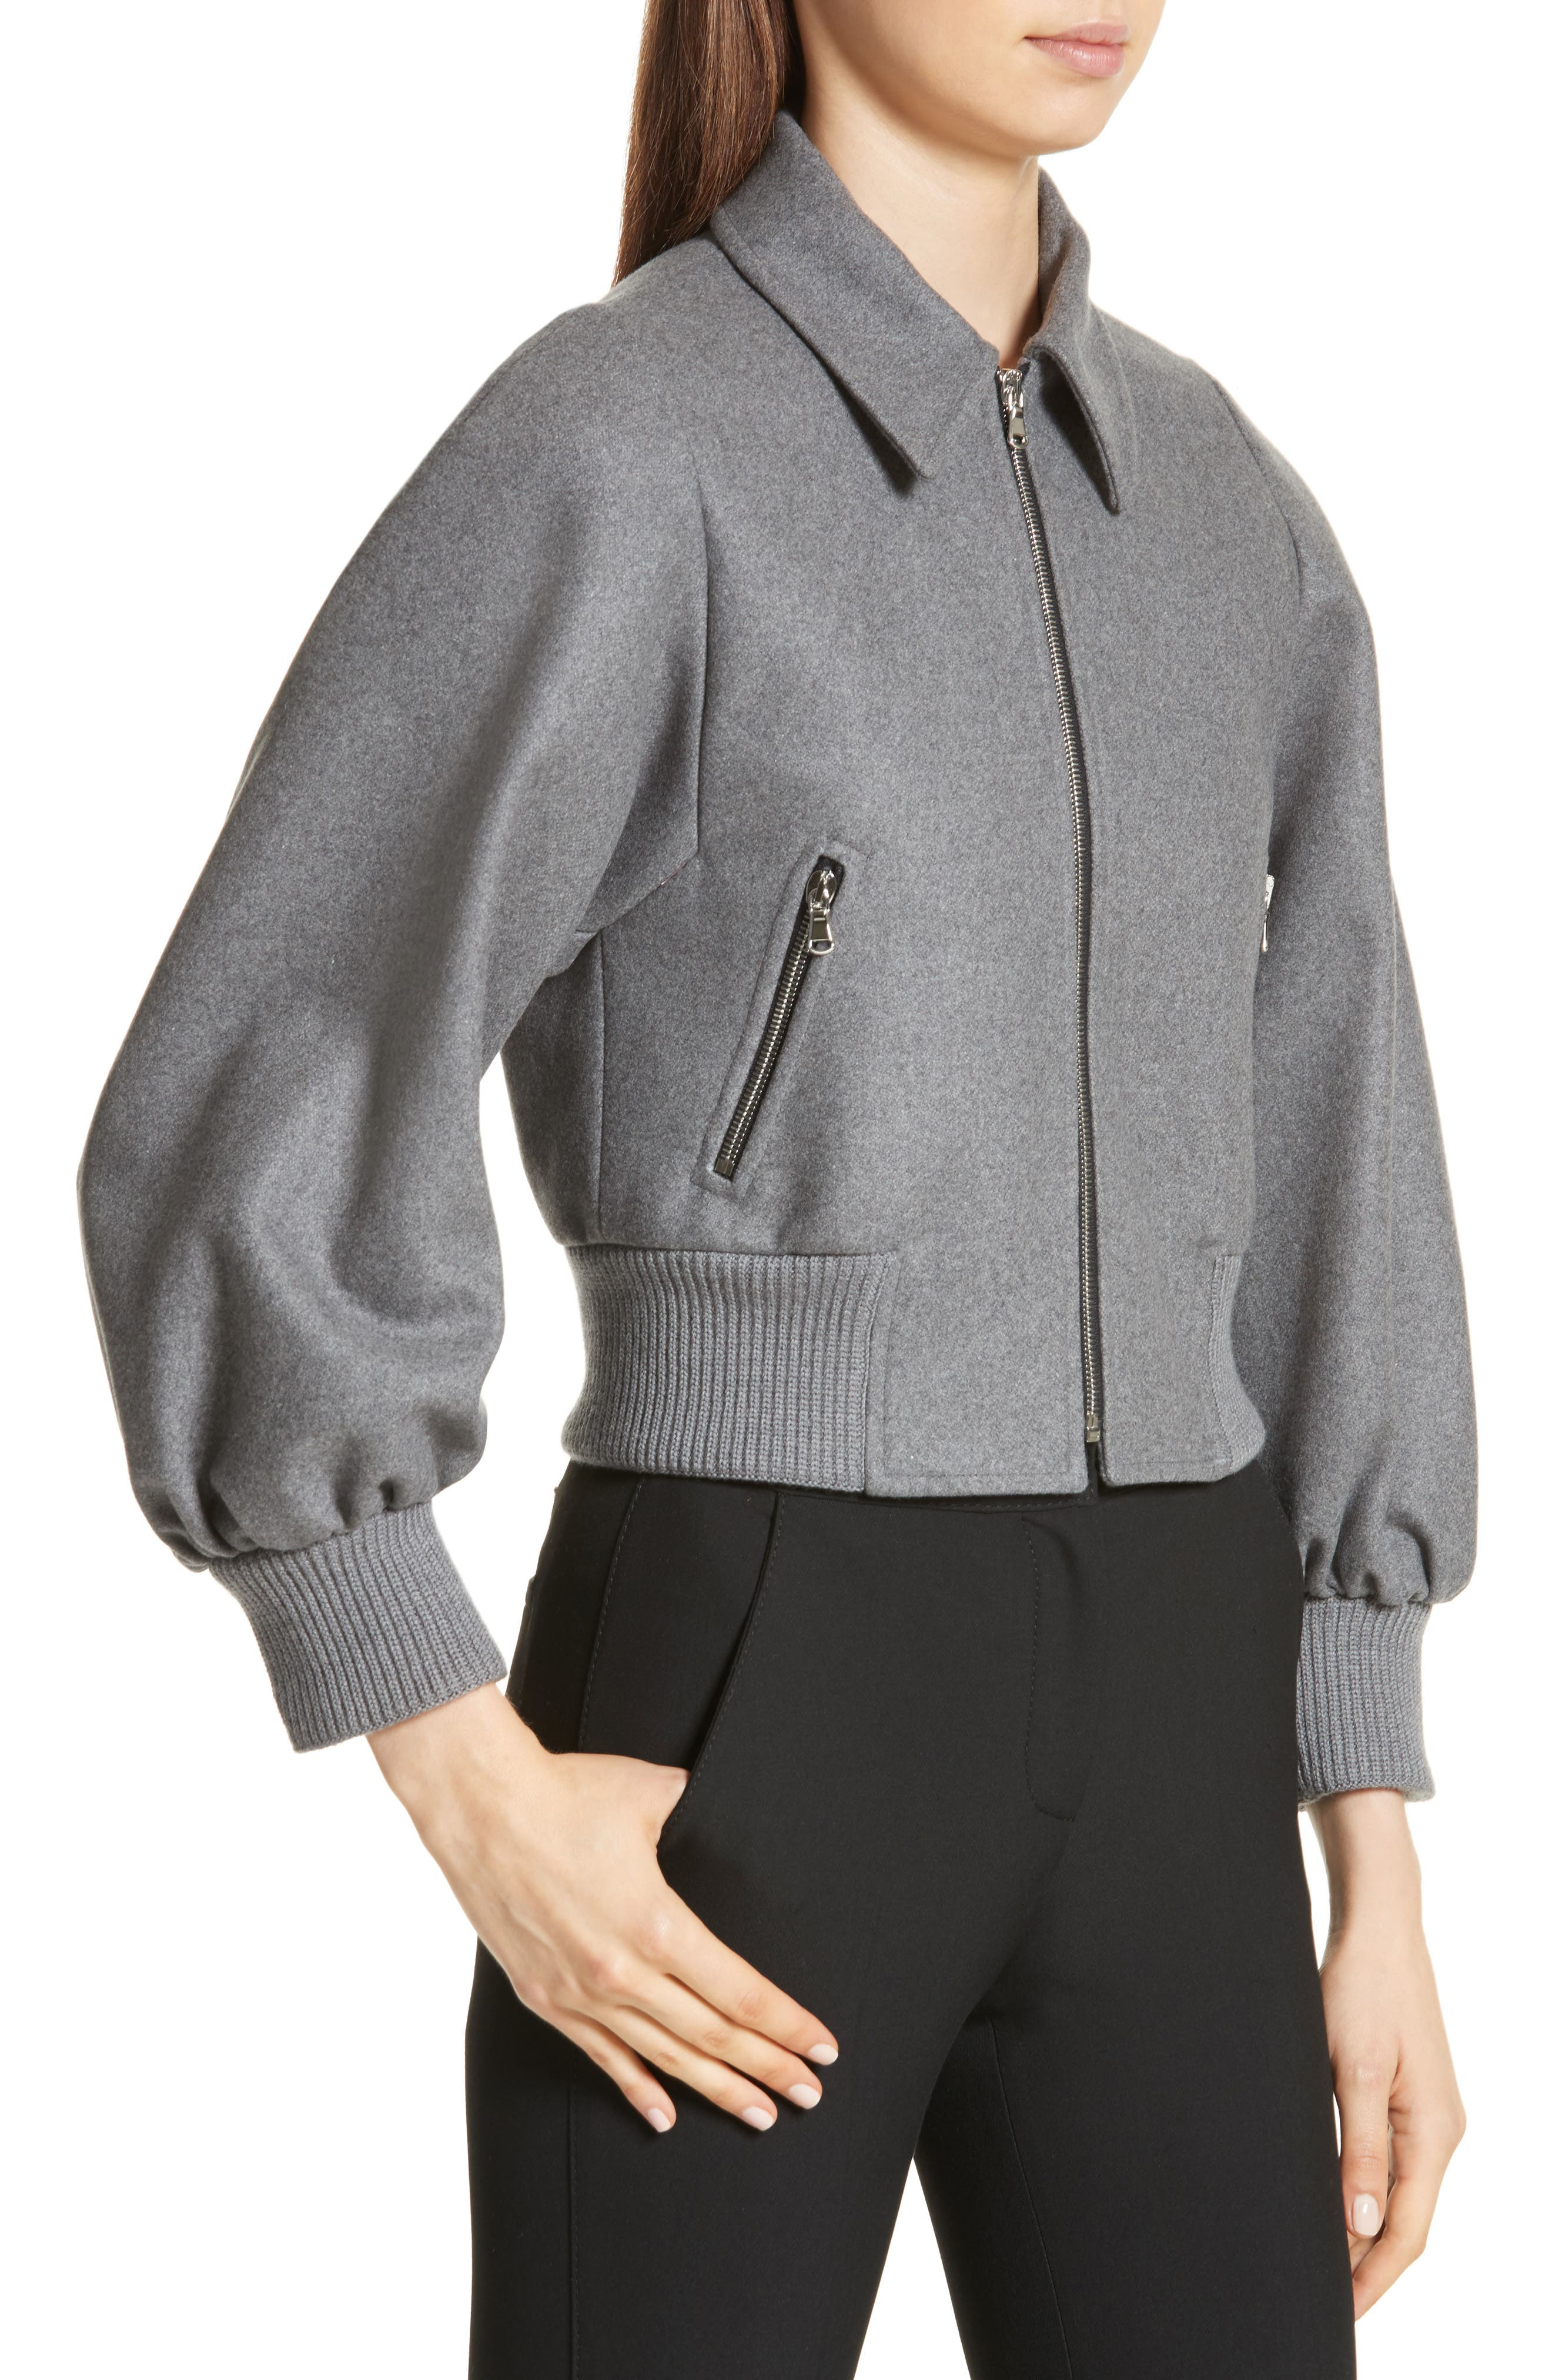 Mélange Wool Blend Jacket,                             Alternate thumbnail 4, color,                             Ardesia